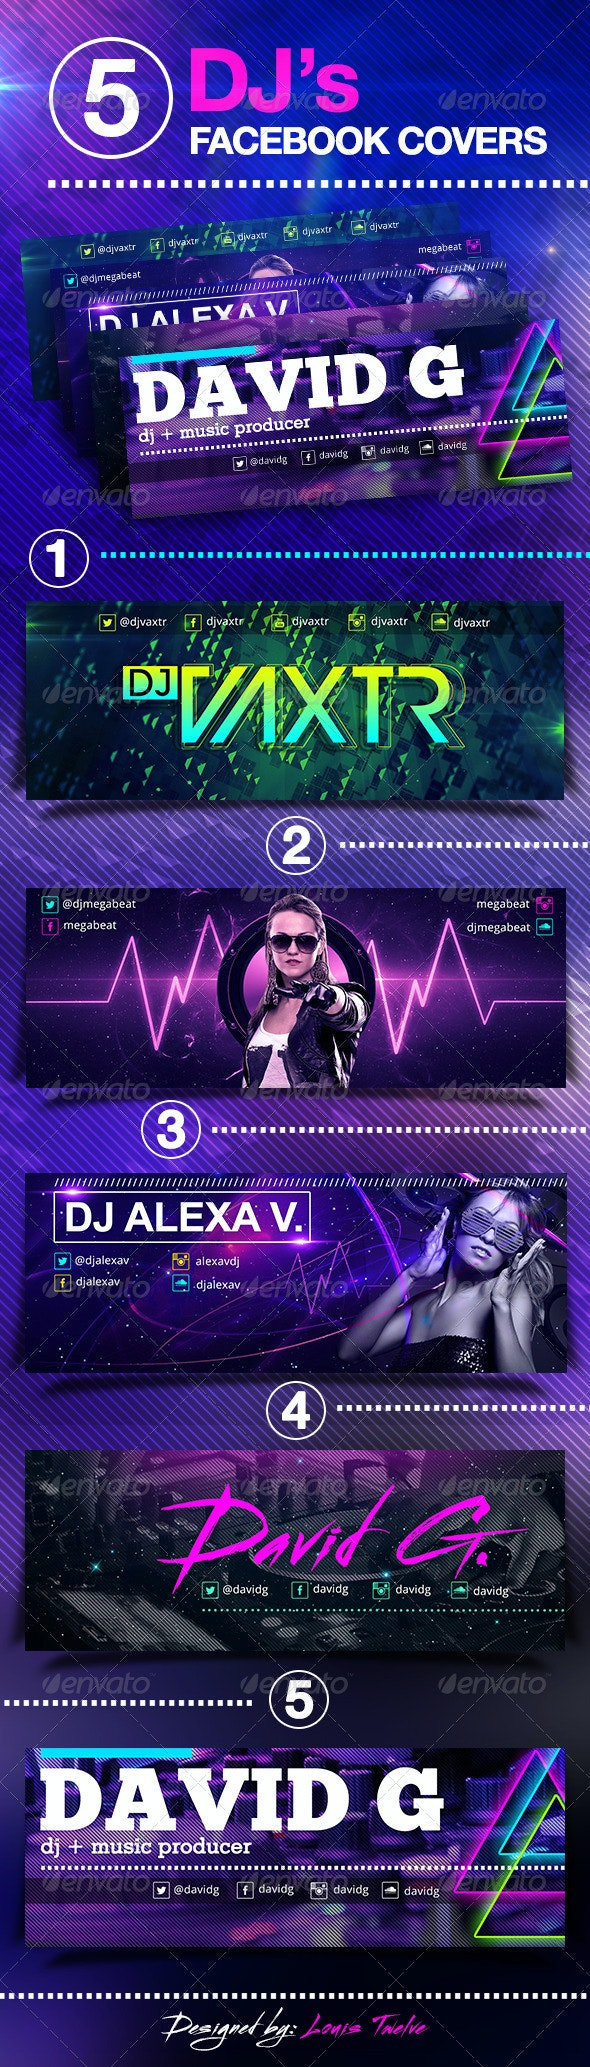 5 Dj's Facebook Covers  - Facebook Timeline Covers Social Media